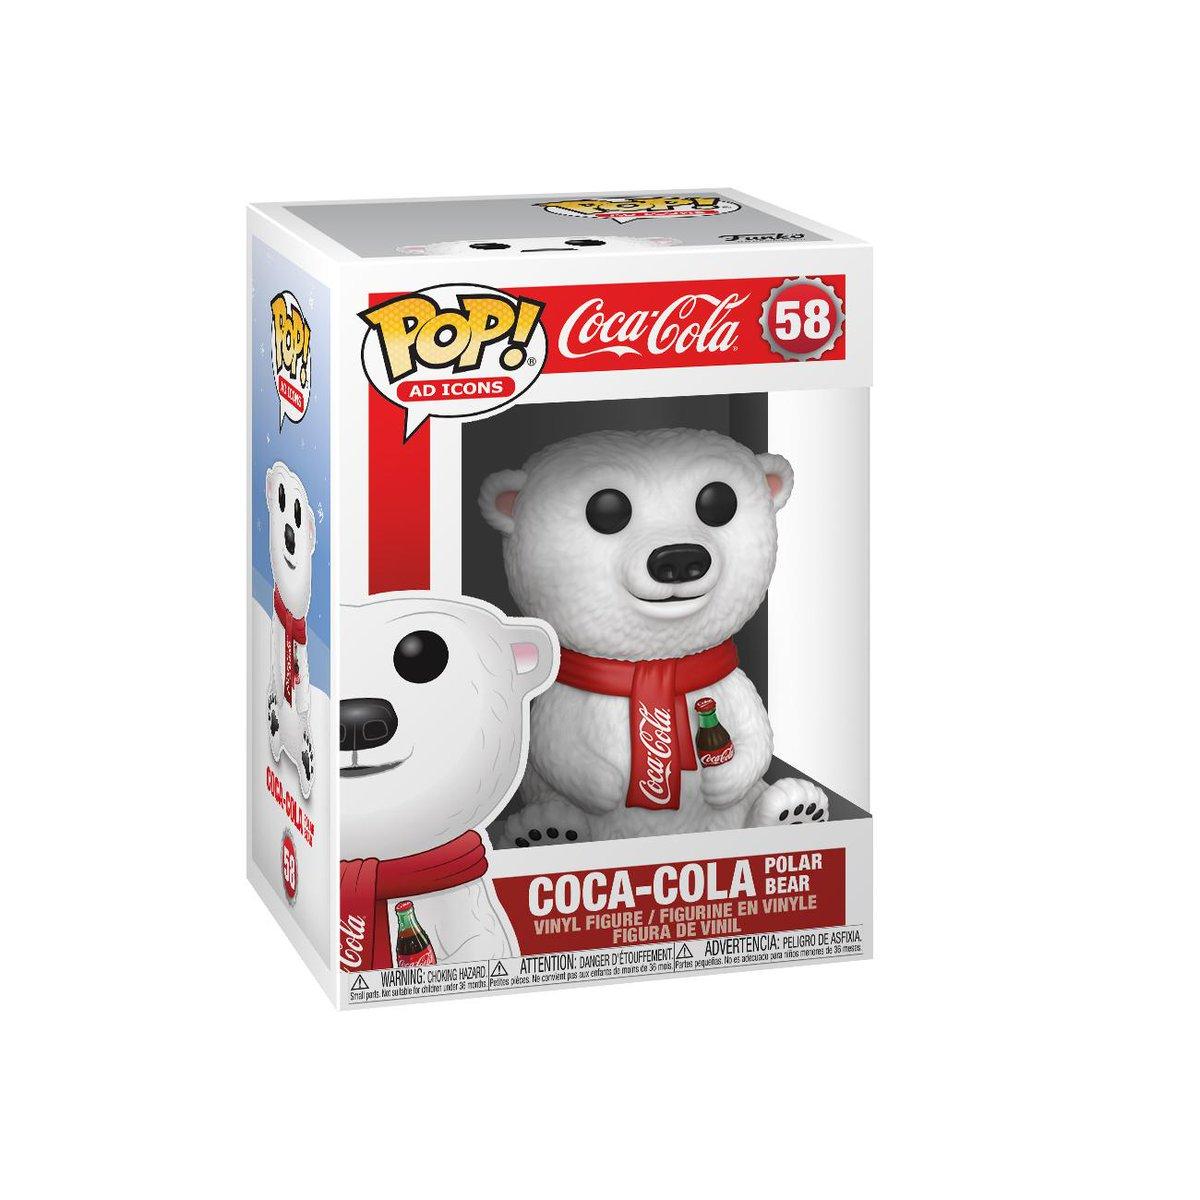 RT & follow @OriginalFunko for a chance to WIN a @CocaCola Polar Bear Pop! #Funko #Pop #FunkoPop #Giveaway